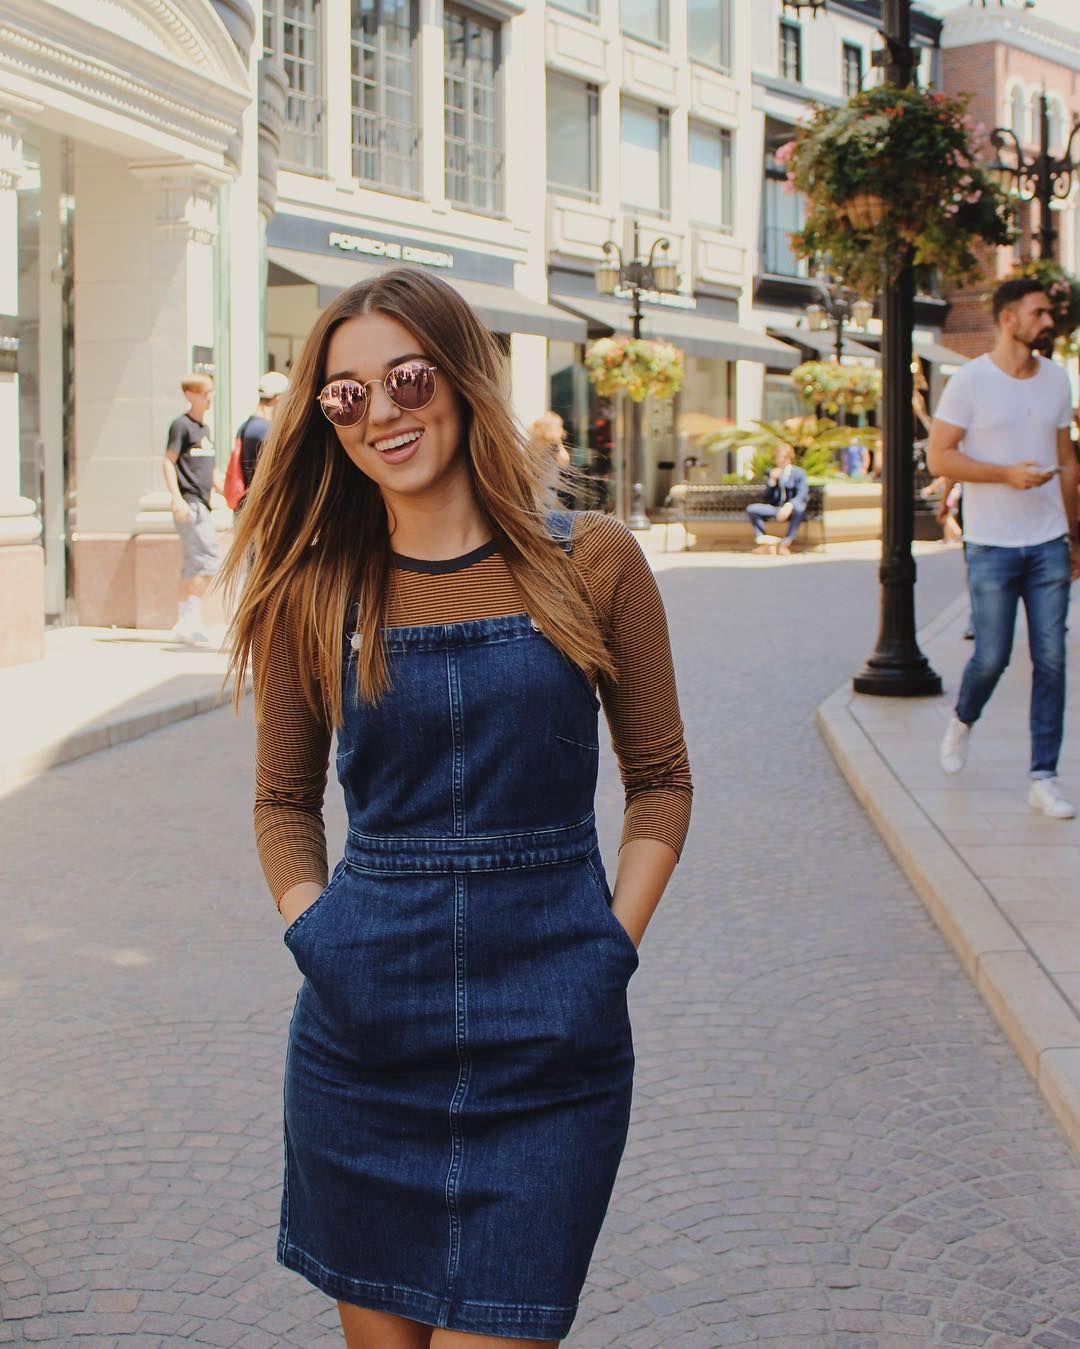 fabulous jumper skirt outfit ideas 10